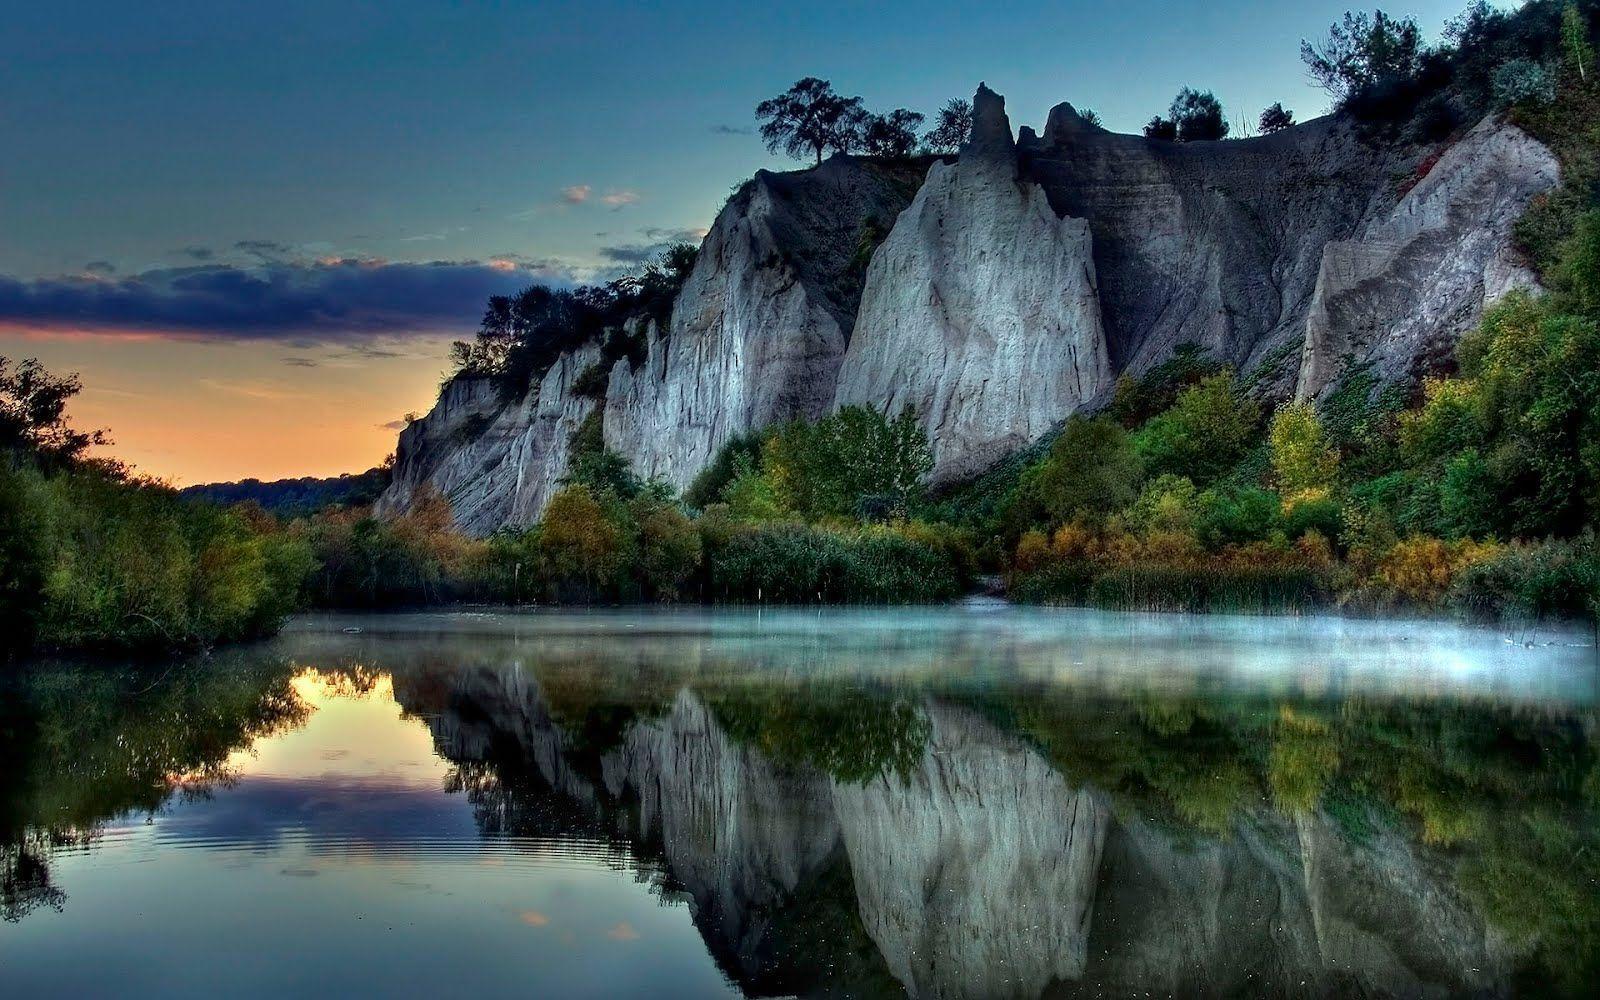 Free Download Hd Nature Wallpaper Desktop